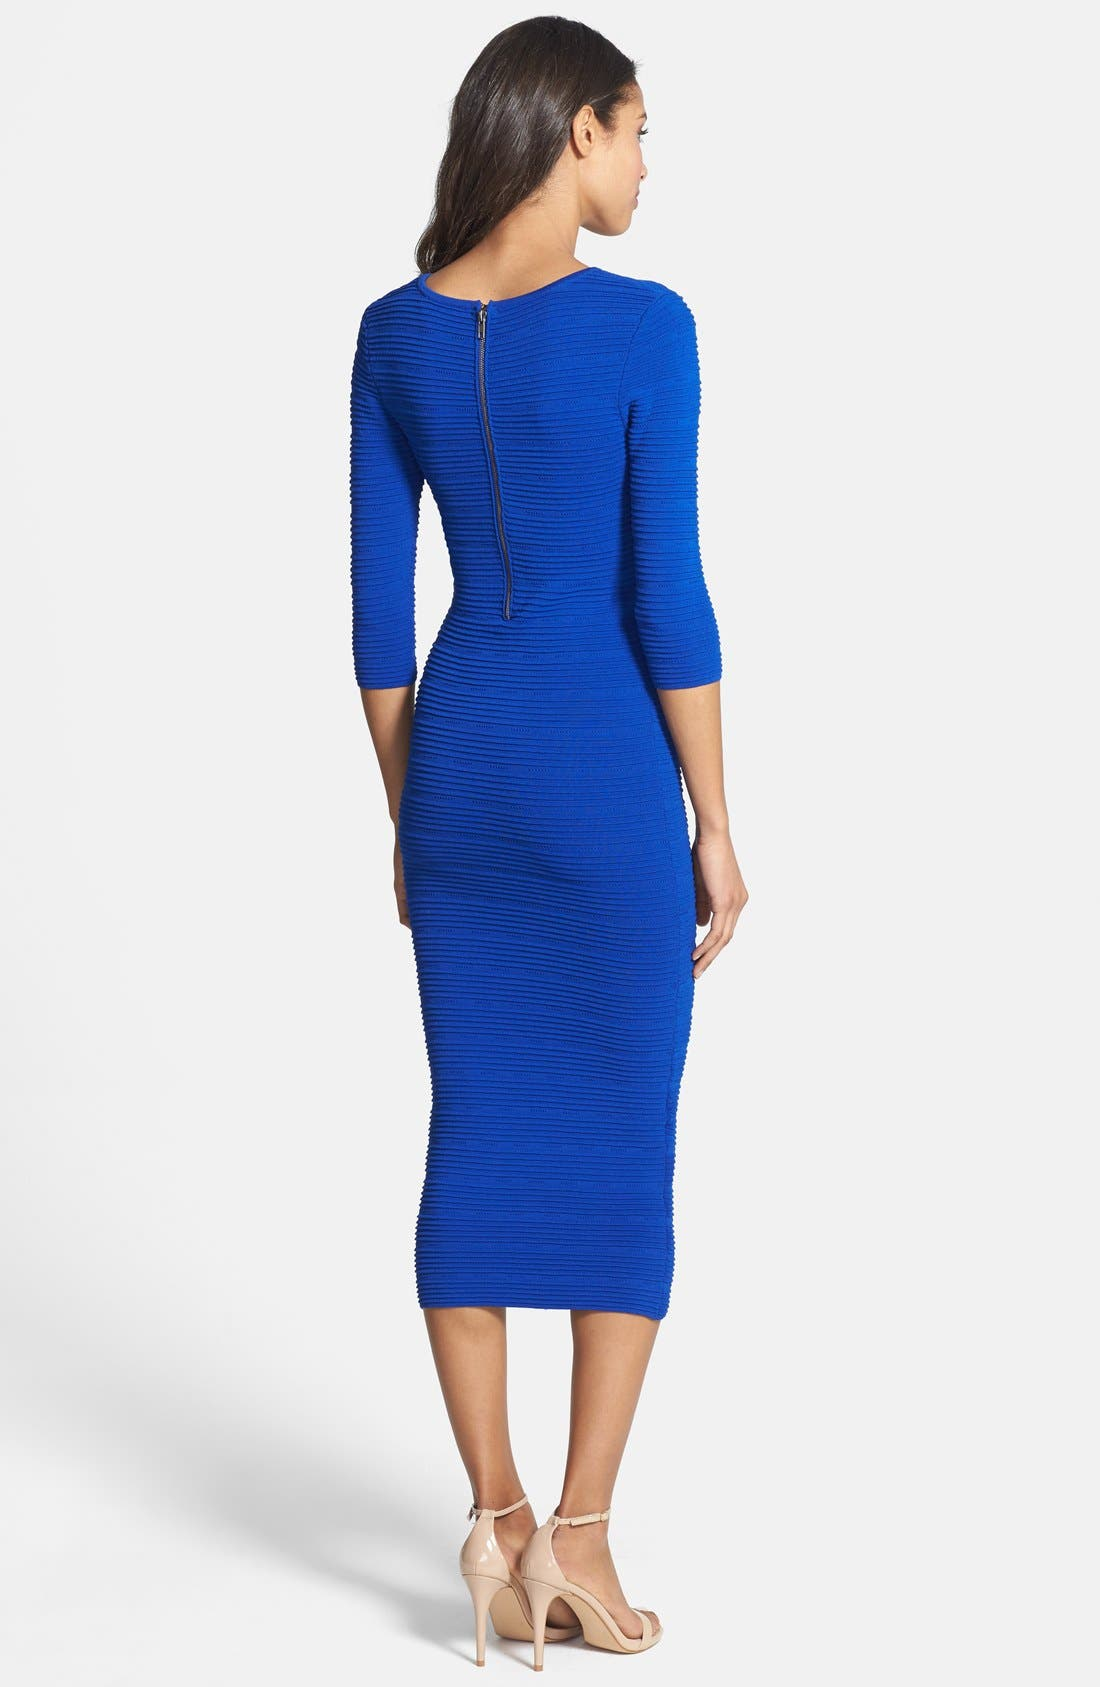 Alternate Image 2  - Felicity & Coco Knit Body-Con Midi Dress (Petite) (Nordstrom Exclusive)